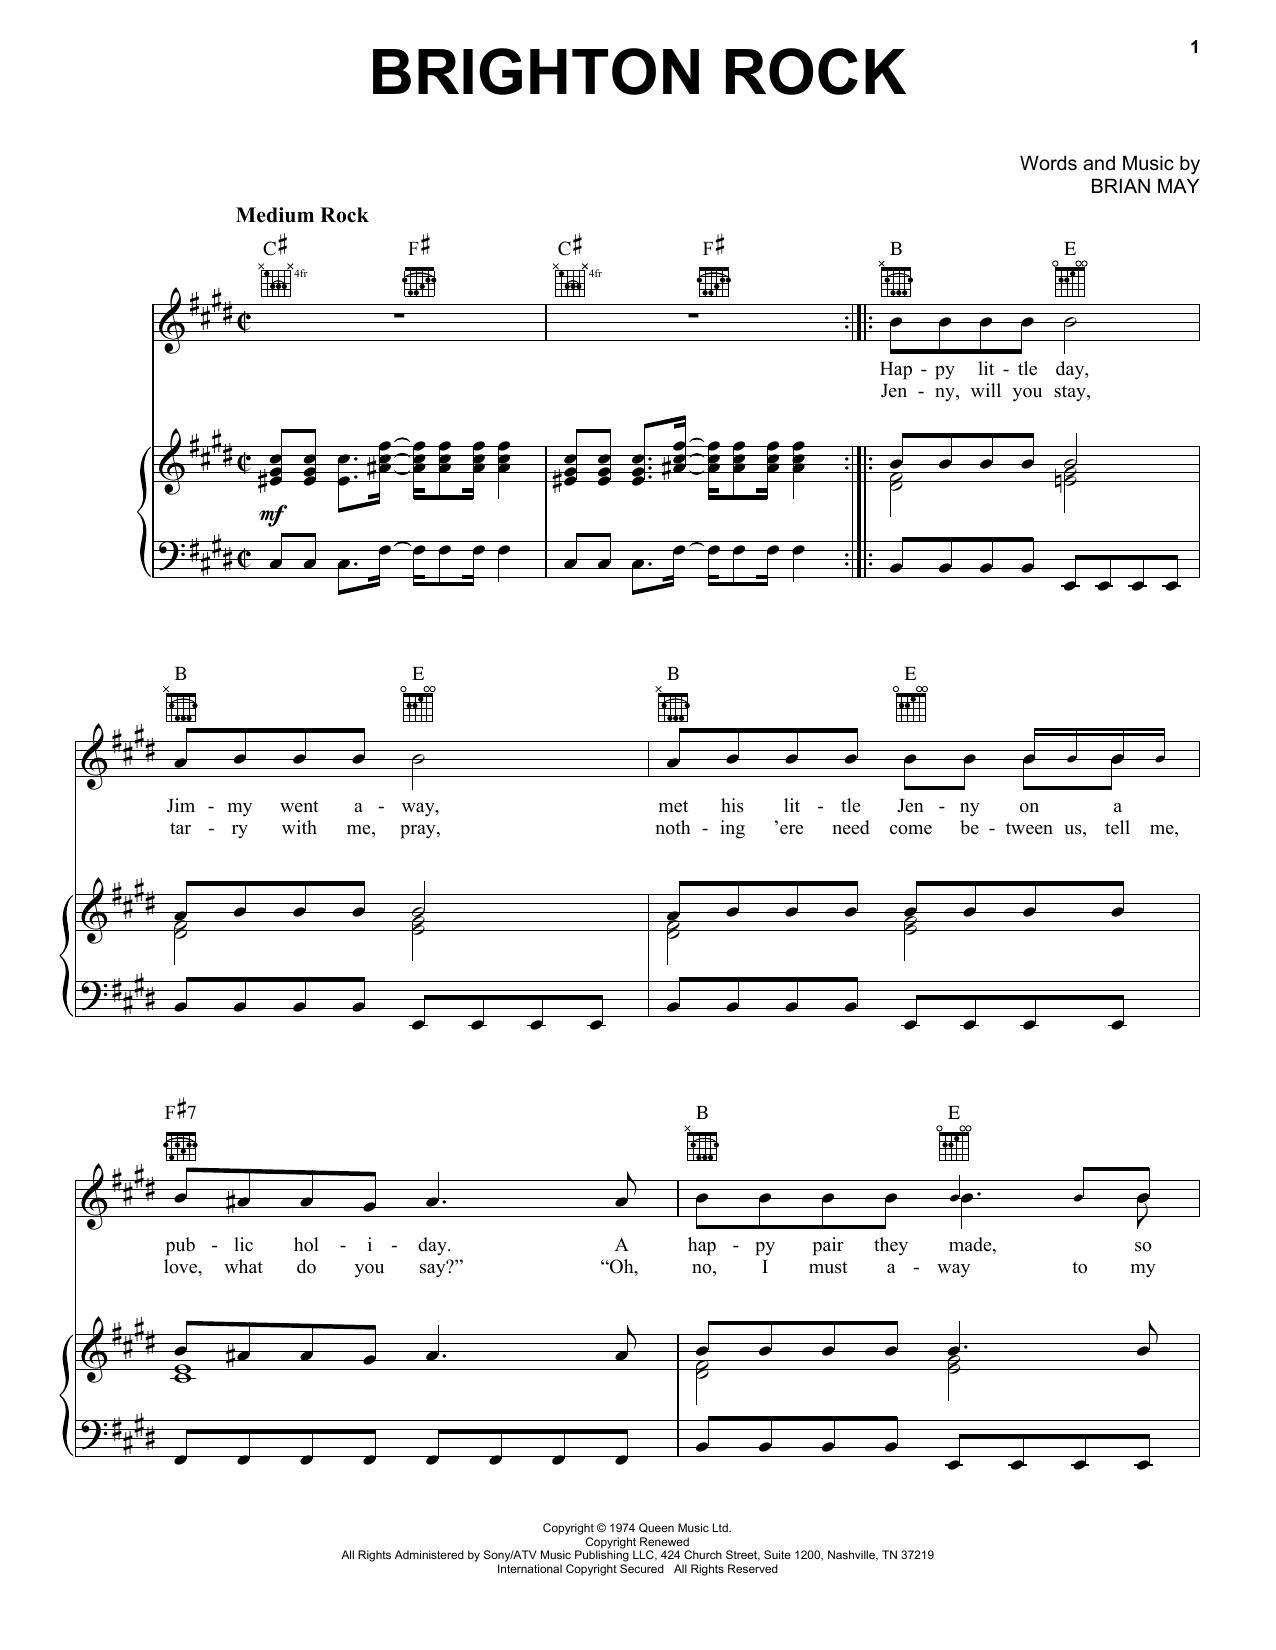 Sheet Music Digital Files To Print Licensed Brian May